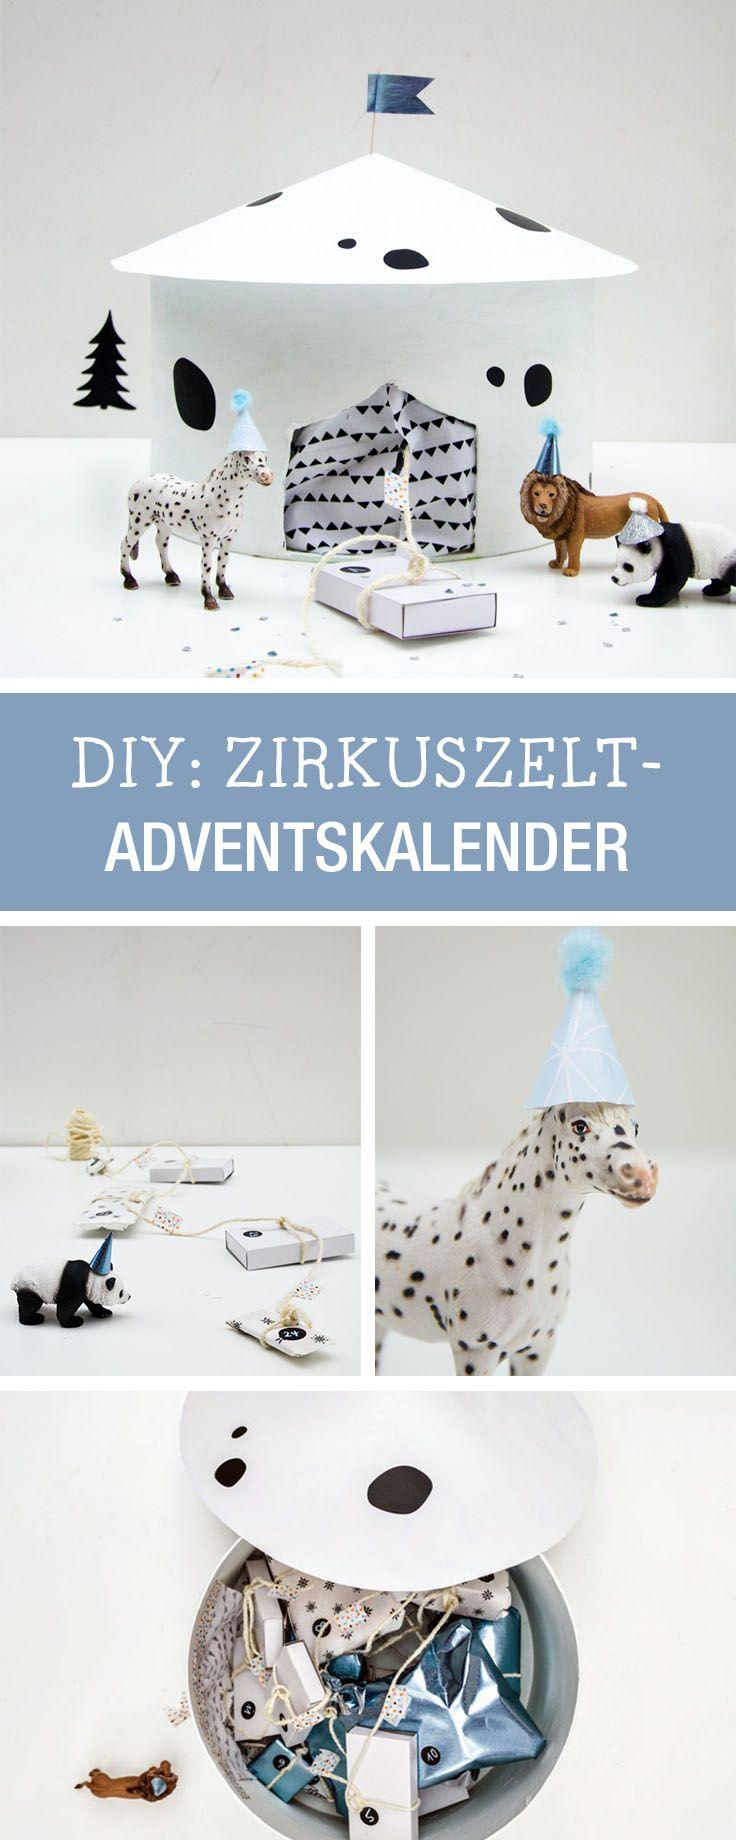 Adventskalender in Form eines Zirkuszelt für Kinder basteln / circus advents calendar for kids via DaWanda.com